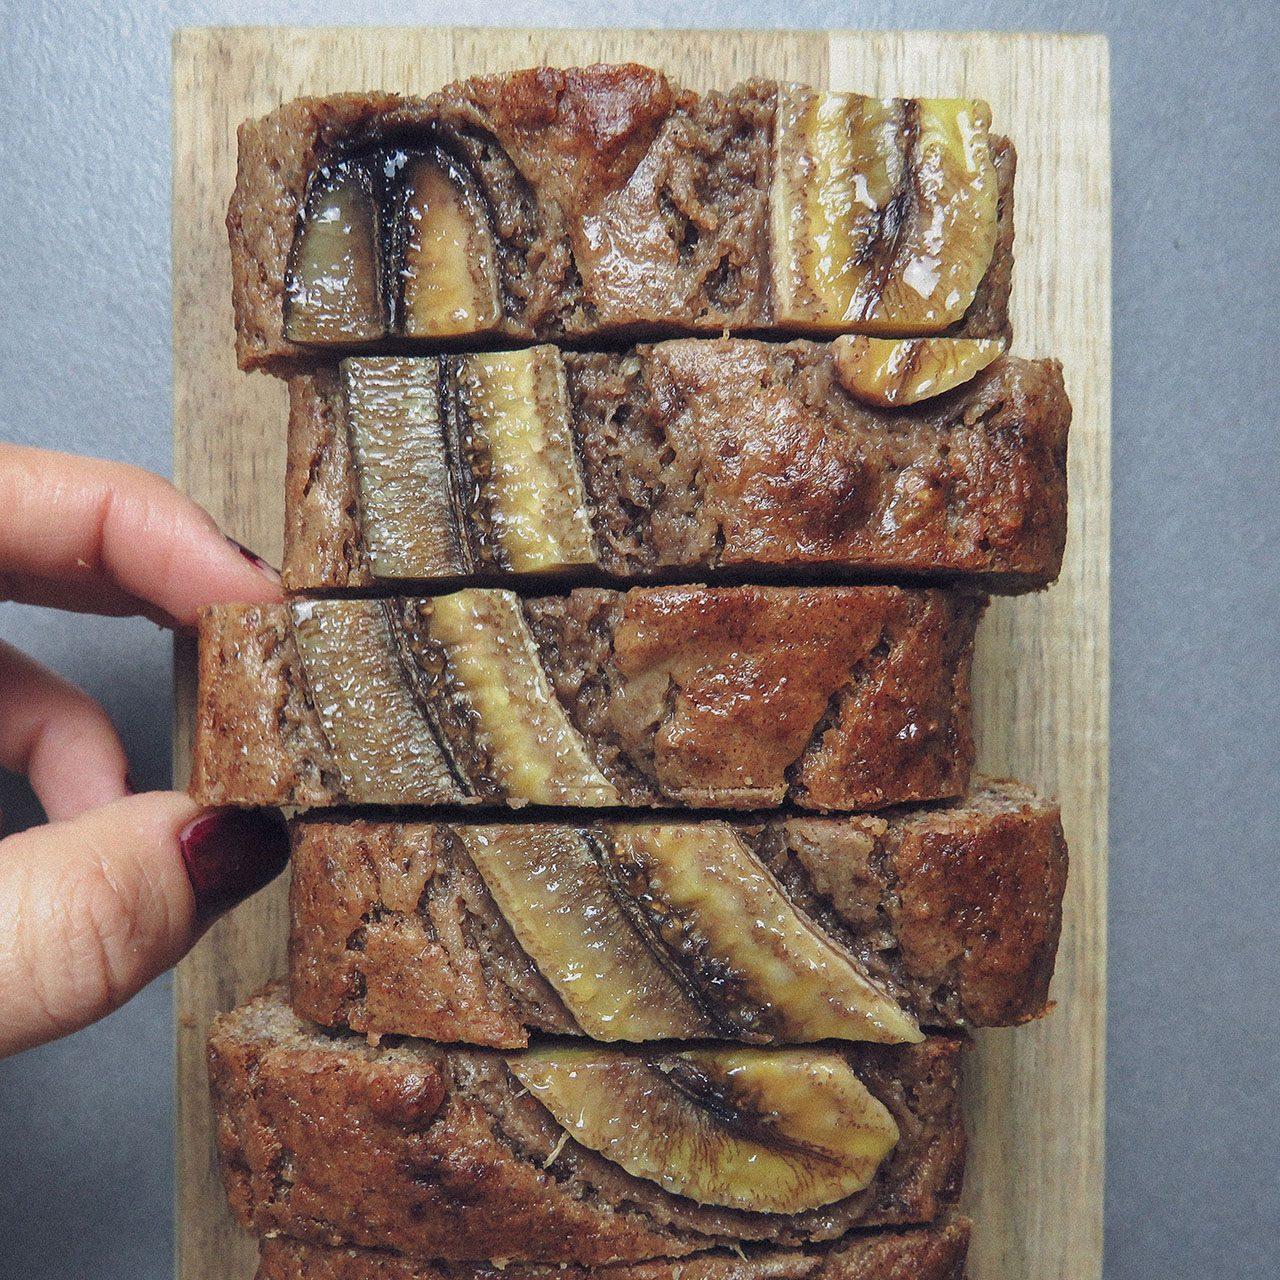 Banana Bread sin azúcar